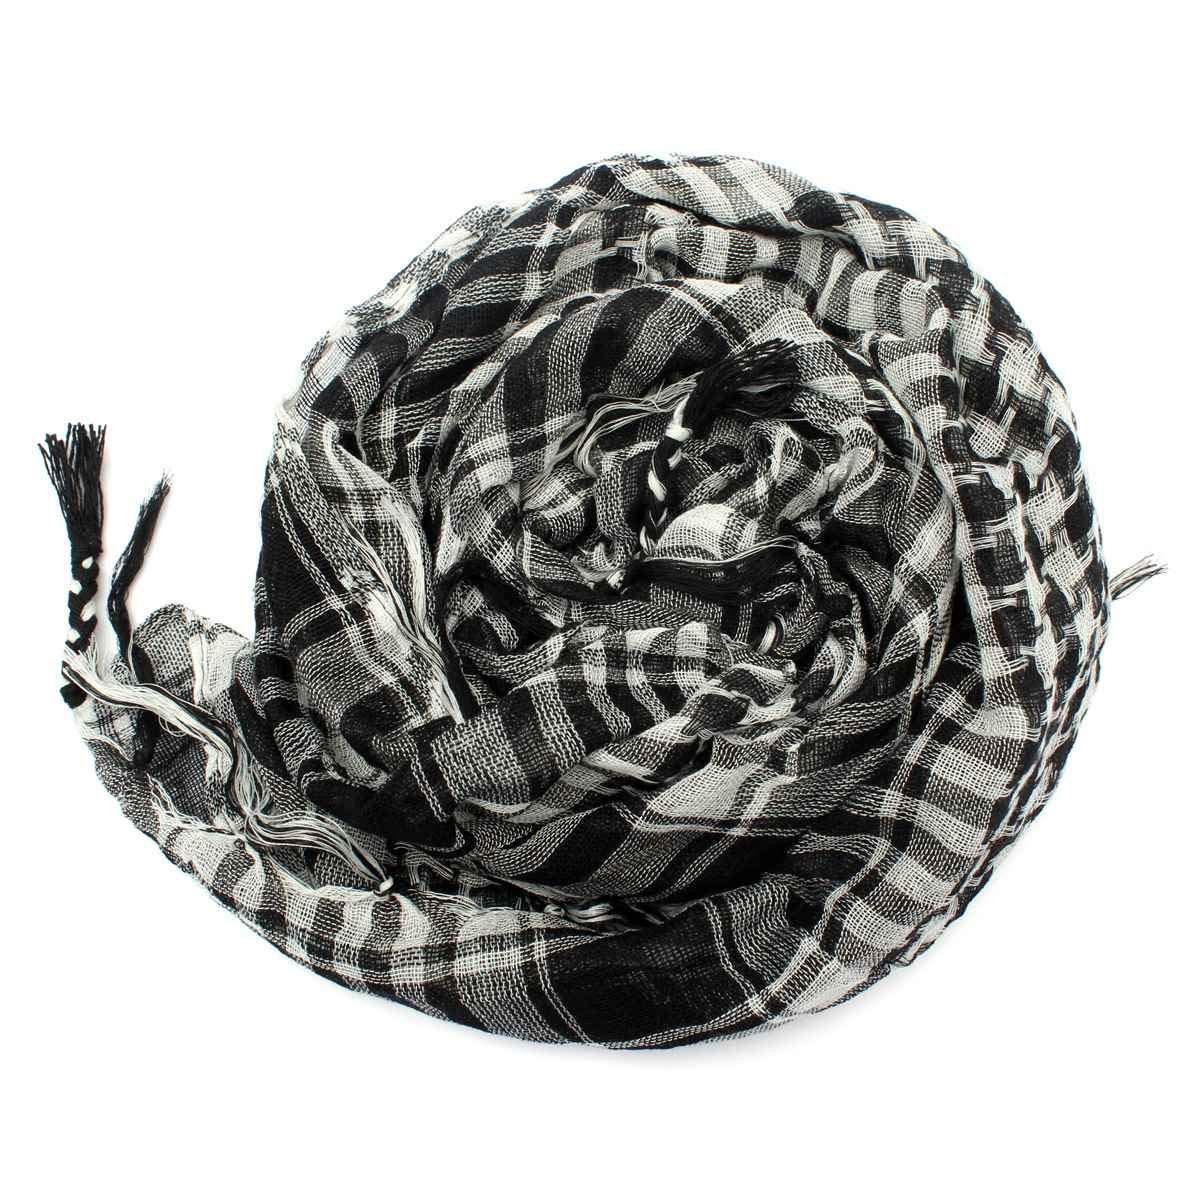 Amazon.com: VT BigHome Lightweight Unisex Tassel Palid Scarf Tactical Arab Desert Shemagh Wraps Women Men Grid Military Scarves Muslim Hijab KeffIyeh: ...